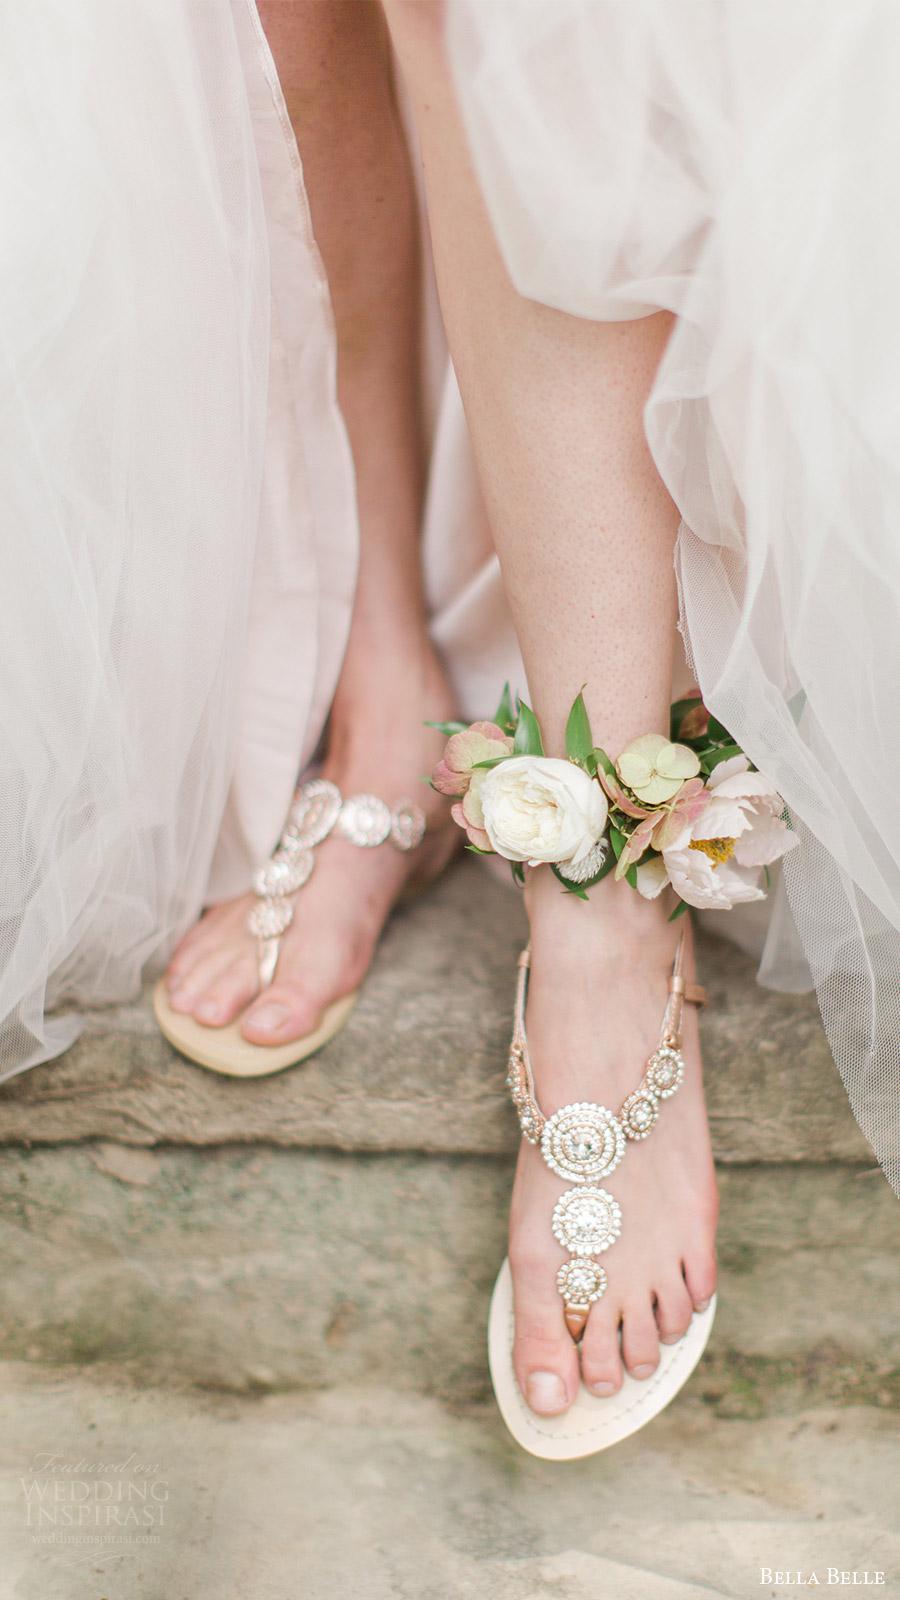 bella belle zapatos de novia 2016 myra sandalias de diamantes de imitación de la boda para las bodas de destino